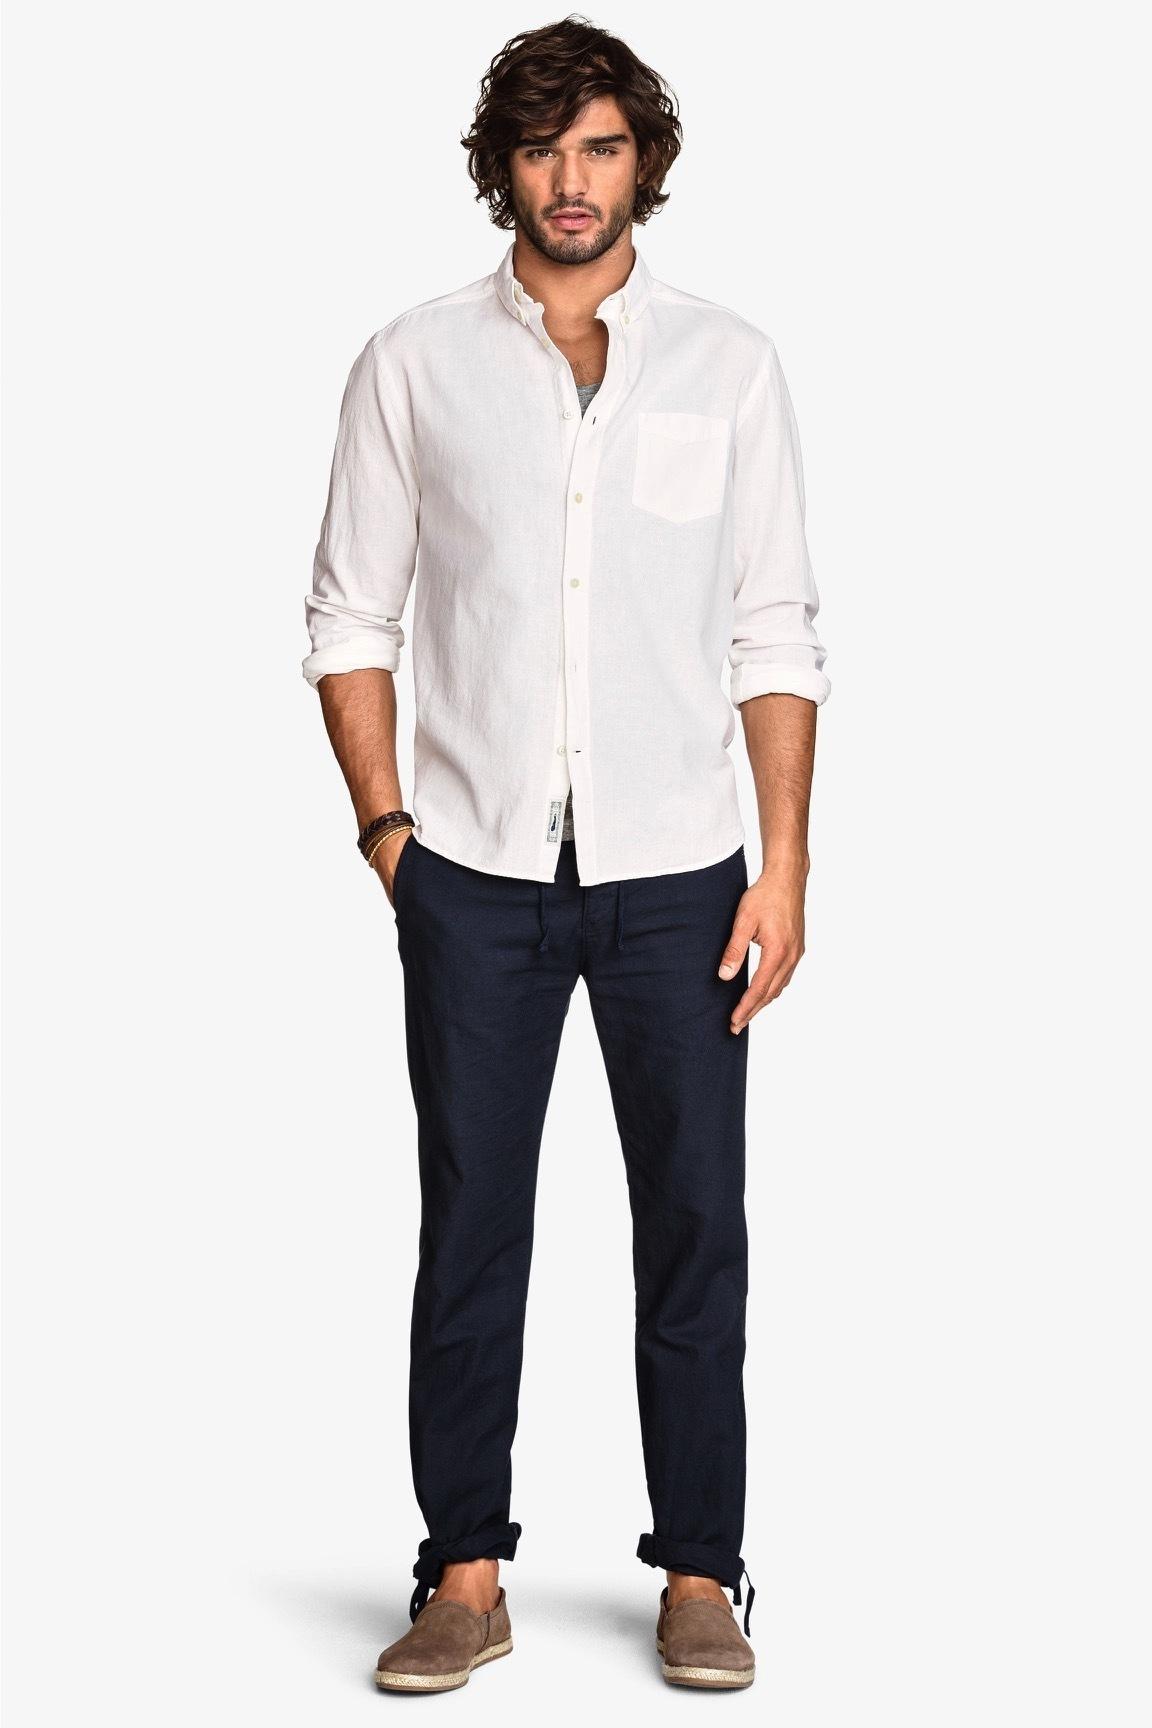 80c989db2a4 Men s White Long Sleeve Shirt